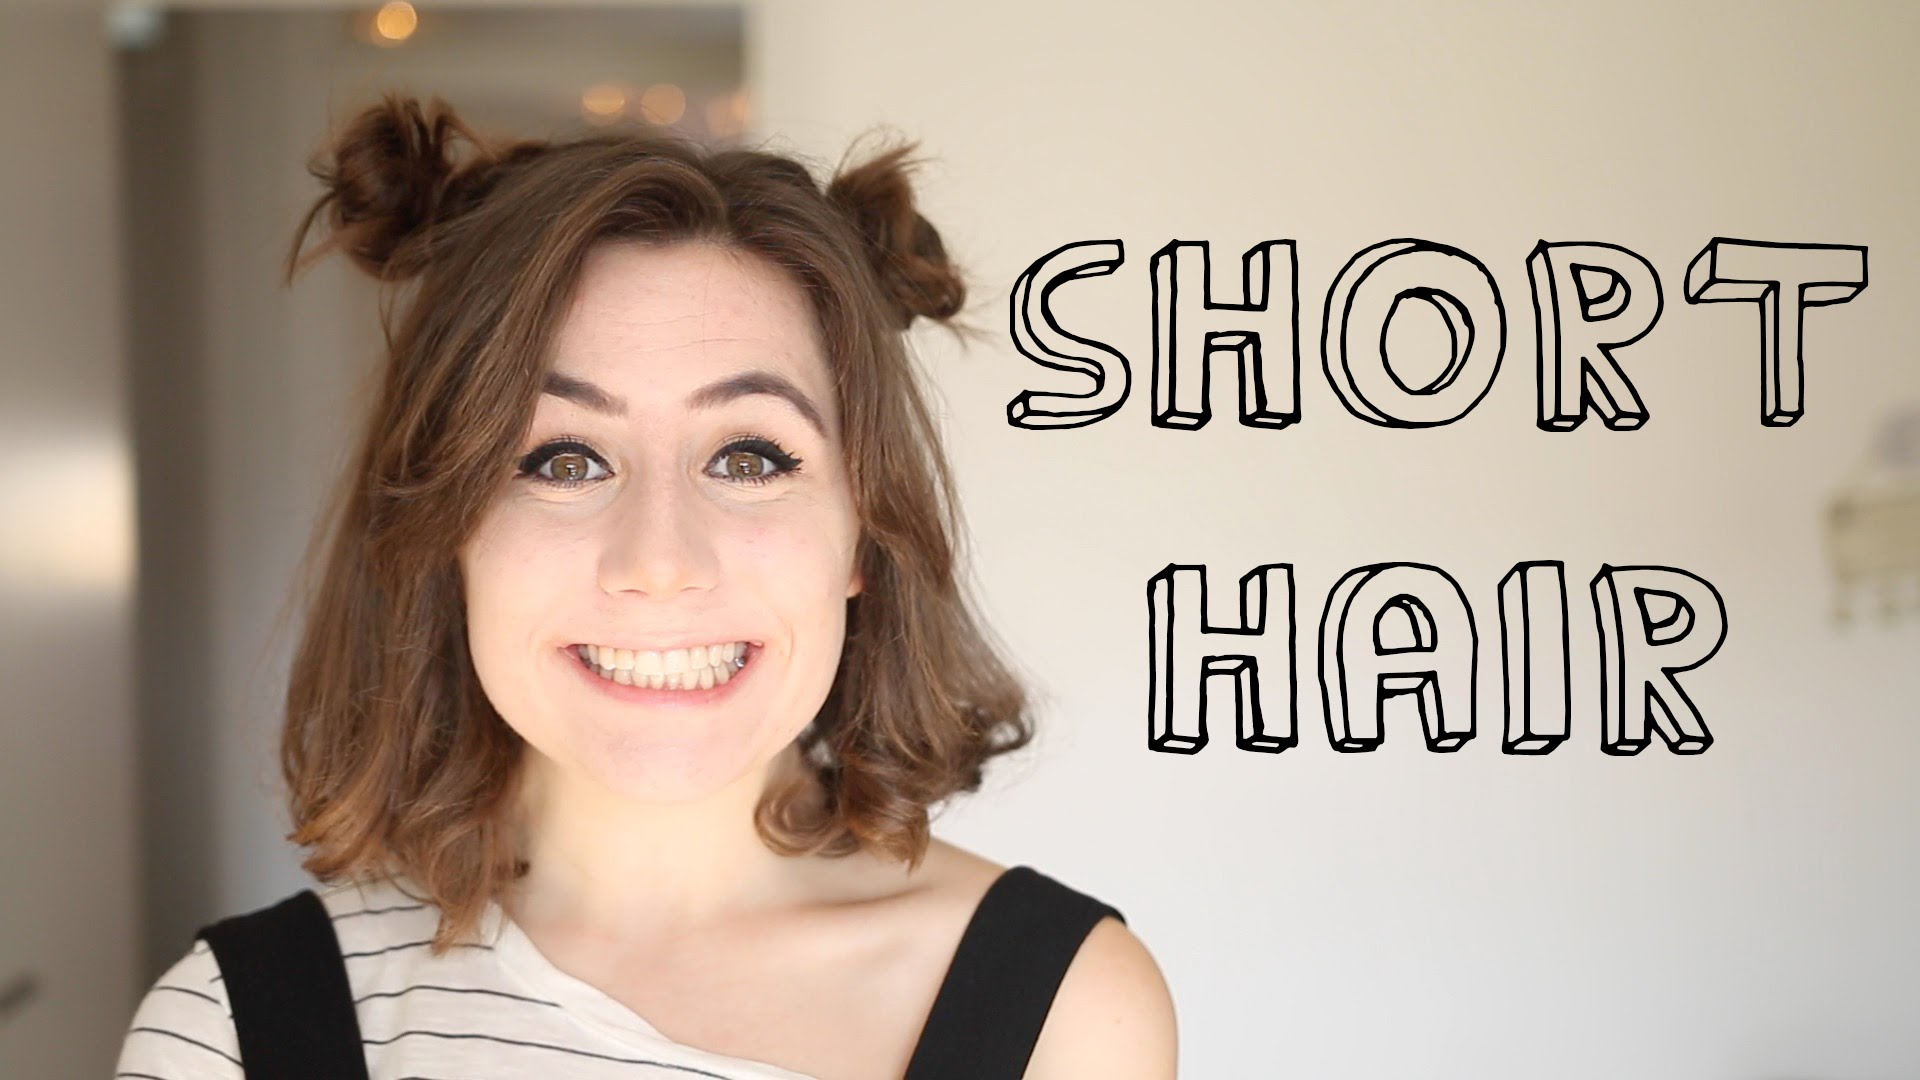 Short Hairstyles!